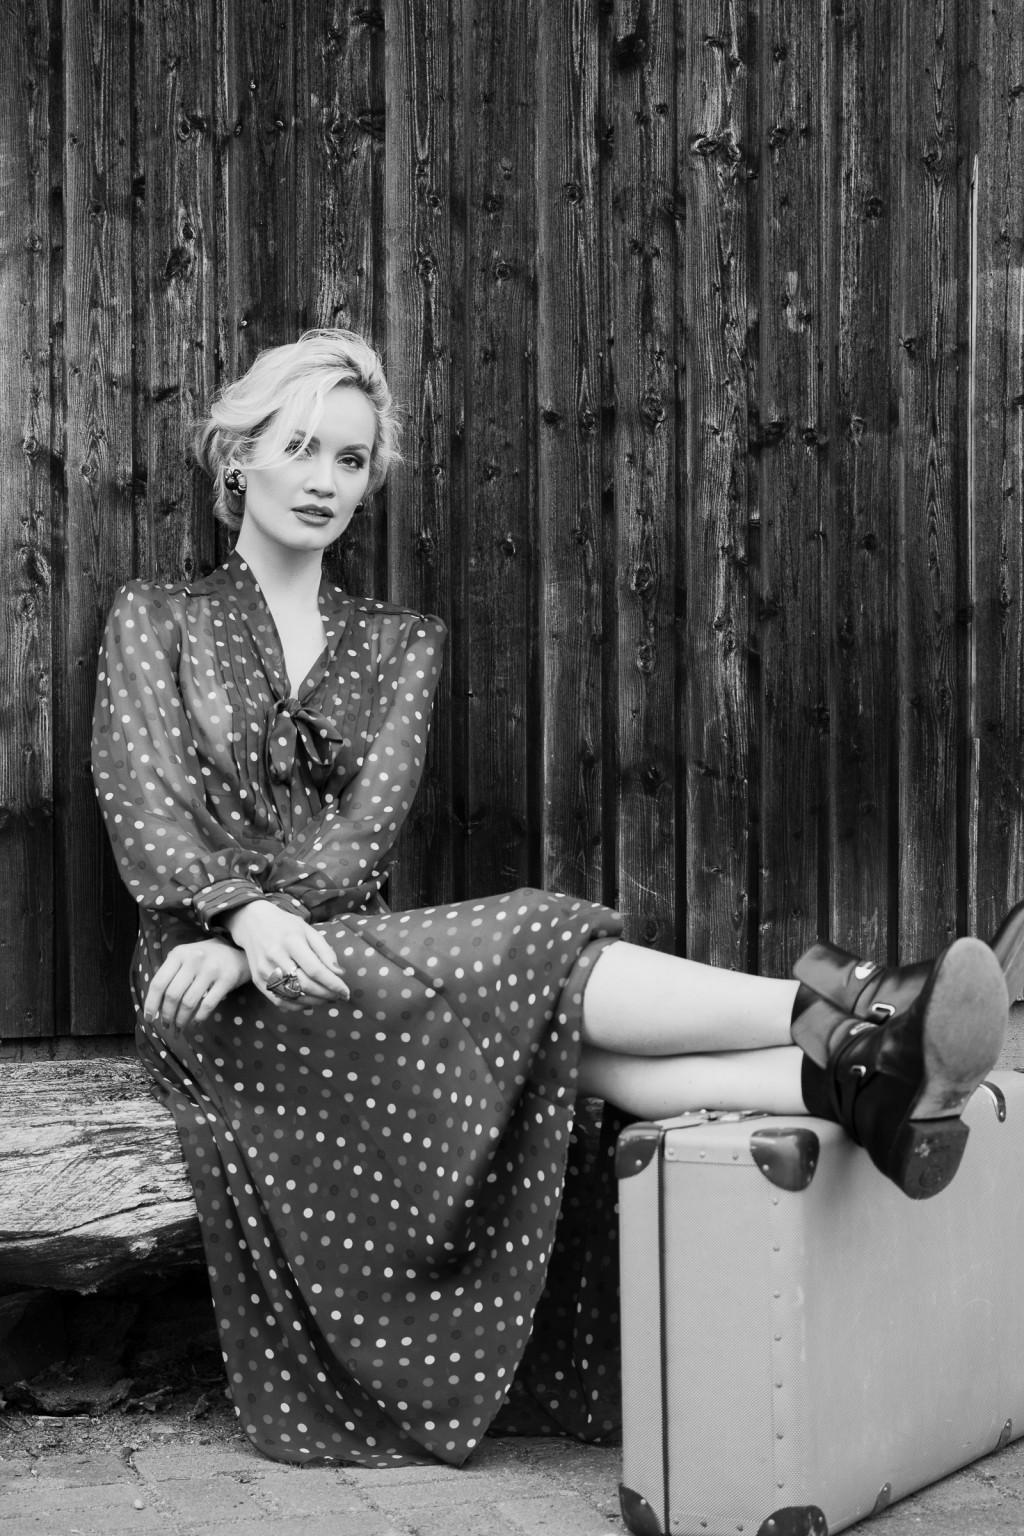 portrait black&white female on location by rosephotography